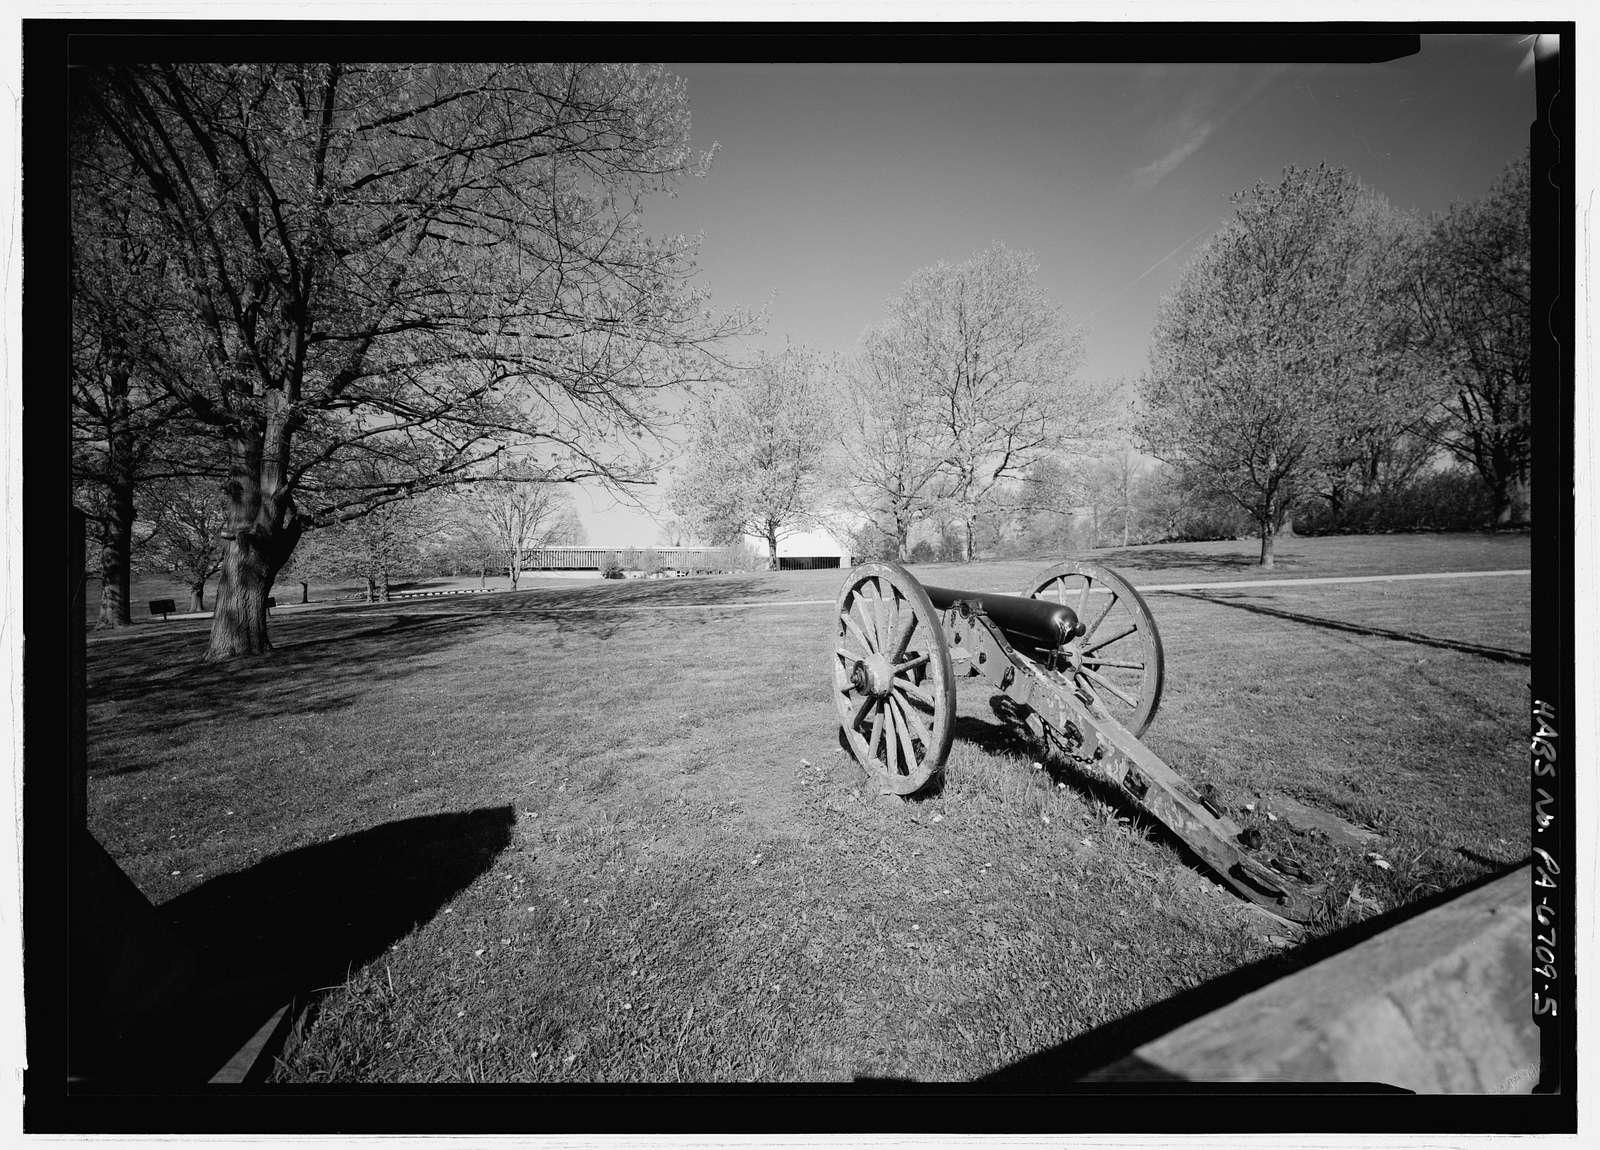 Cyclorama Building, 125 Taneytown Road, Gettysburg, Adams County, PA